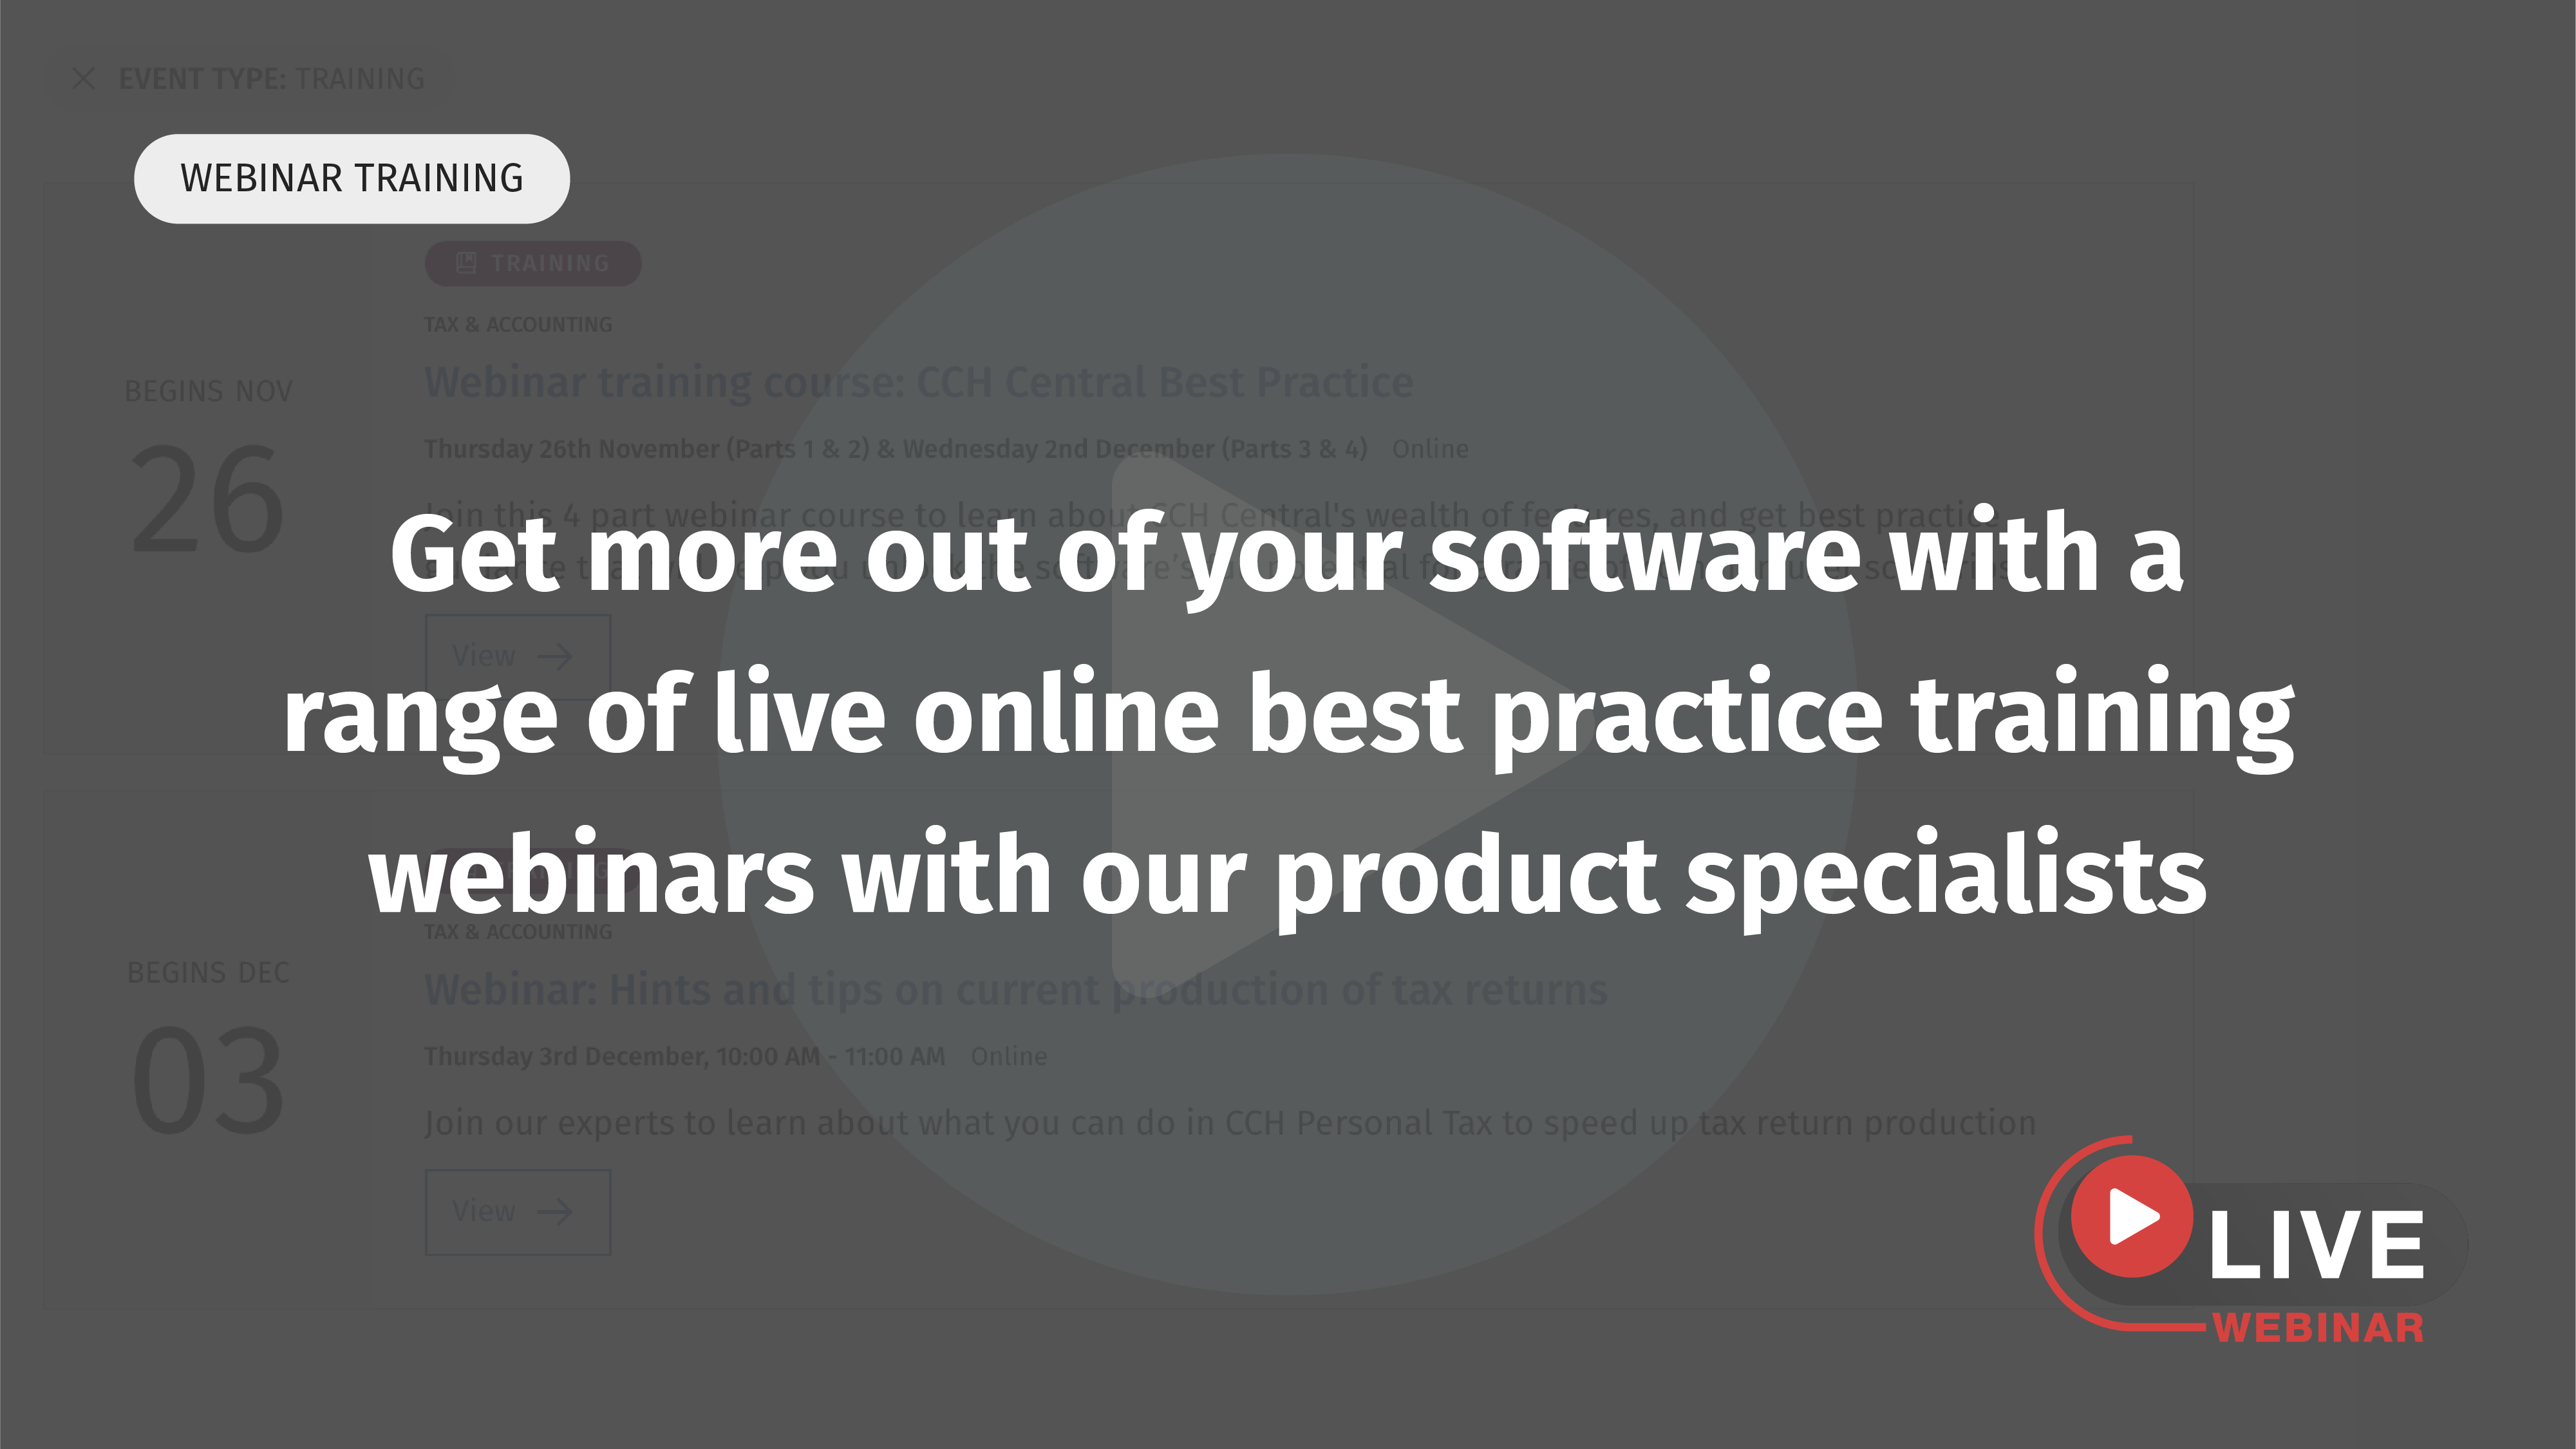 Live webinar training events